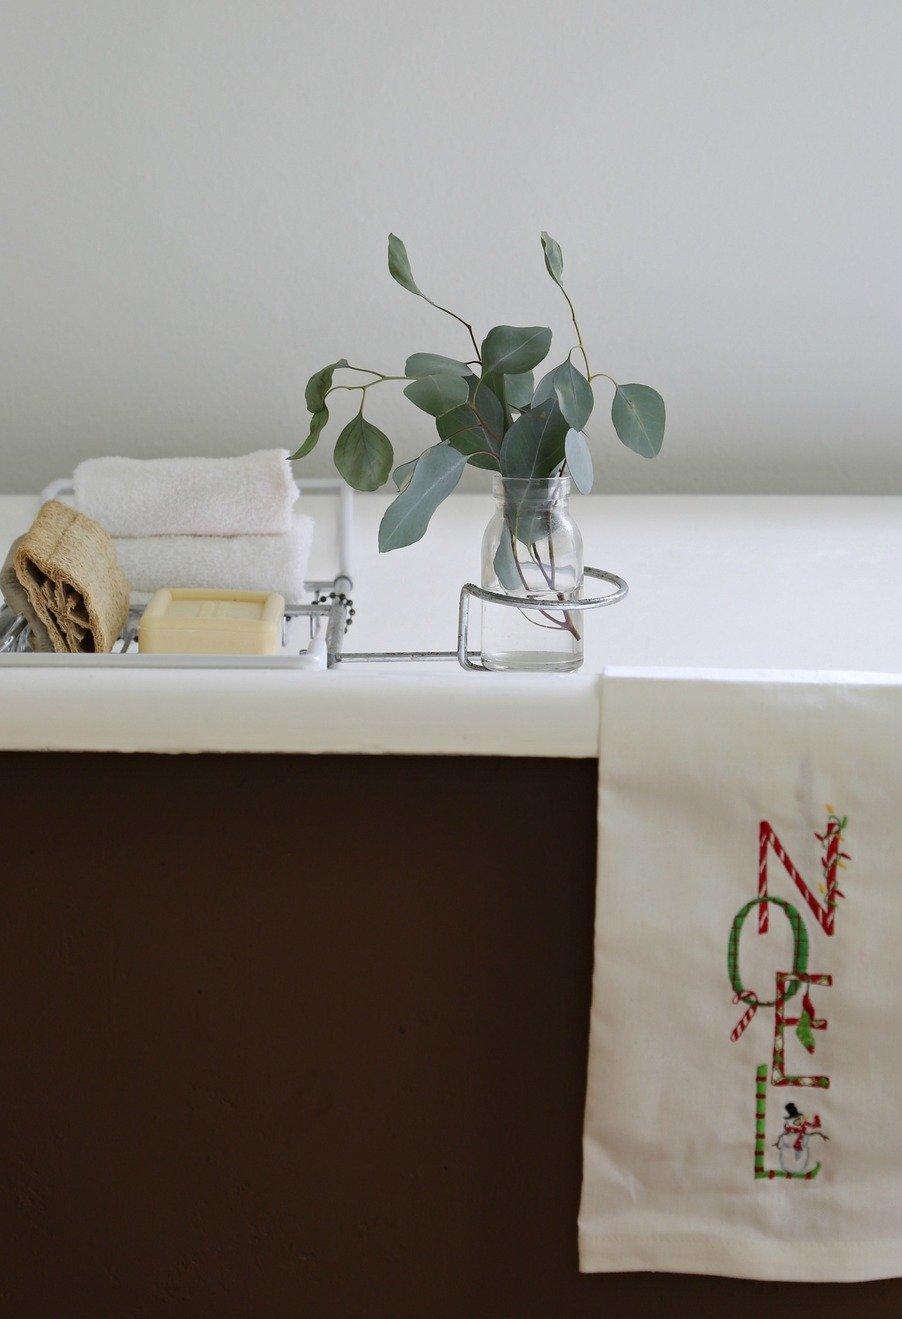 Claw foot bathtub with eucalyptus